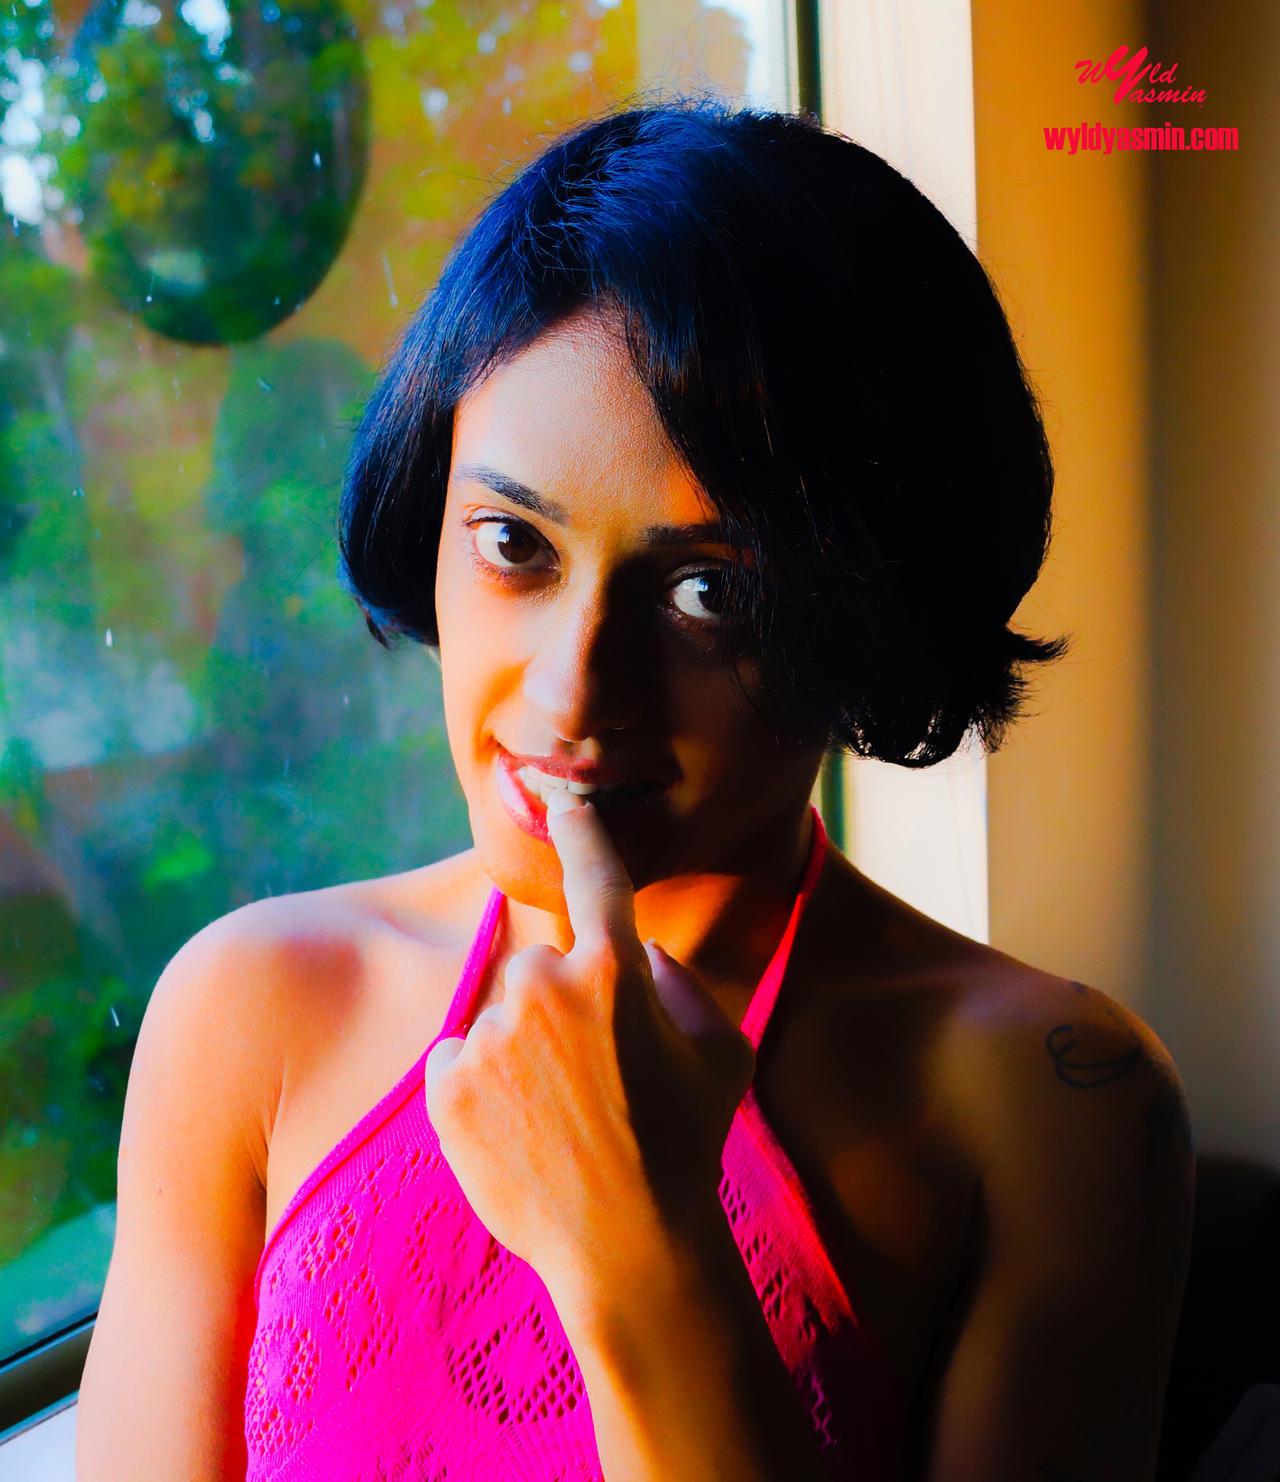 Zahra Soltanian (Wyld Yasmin) Essence of Beauty